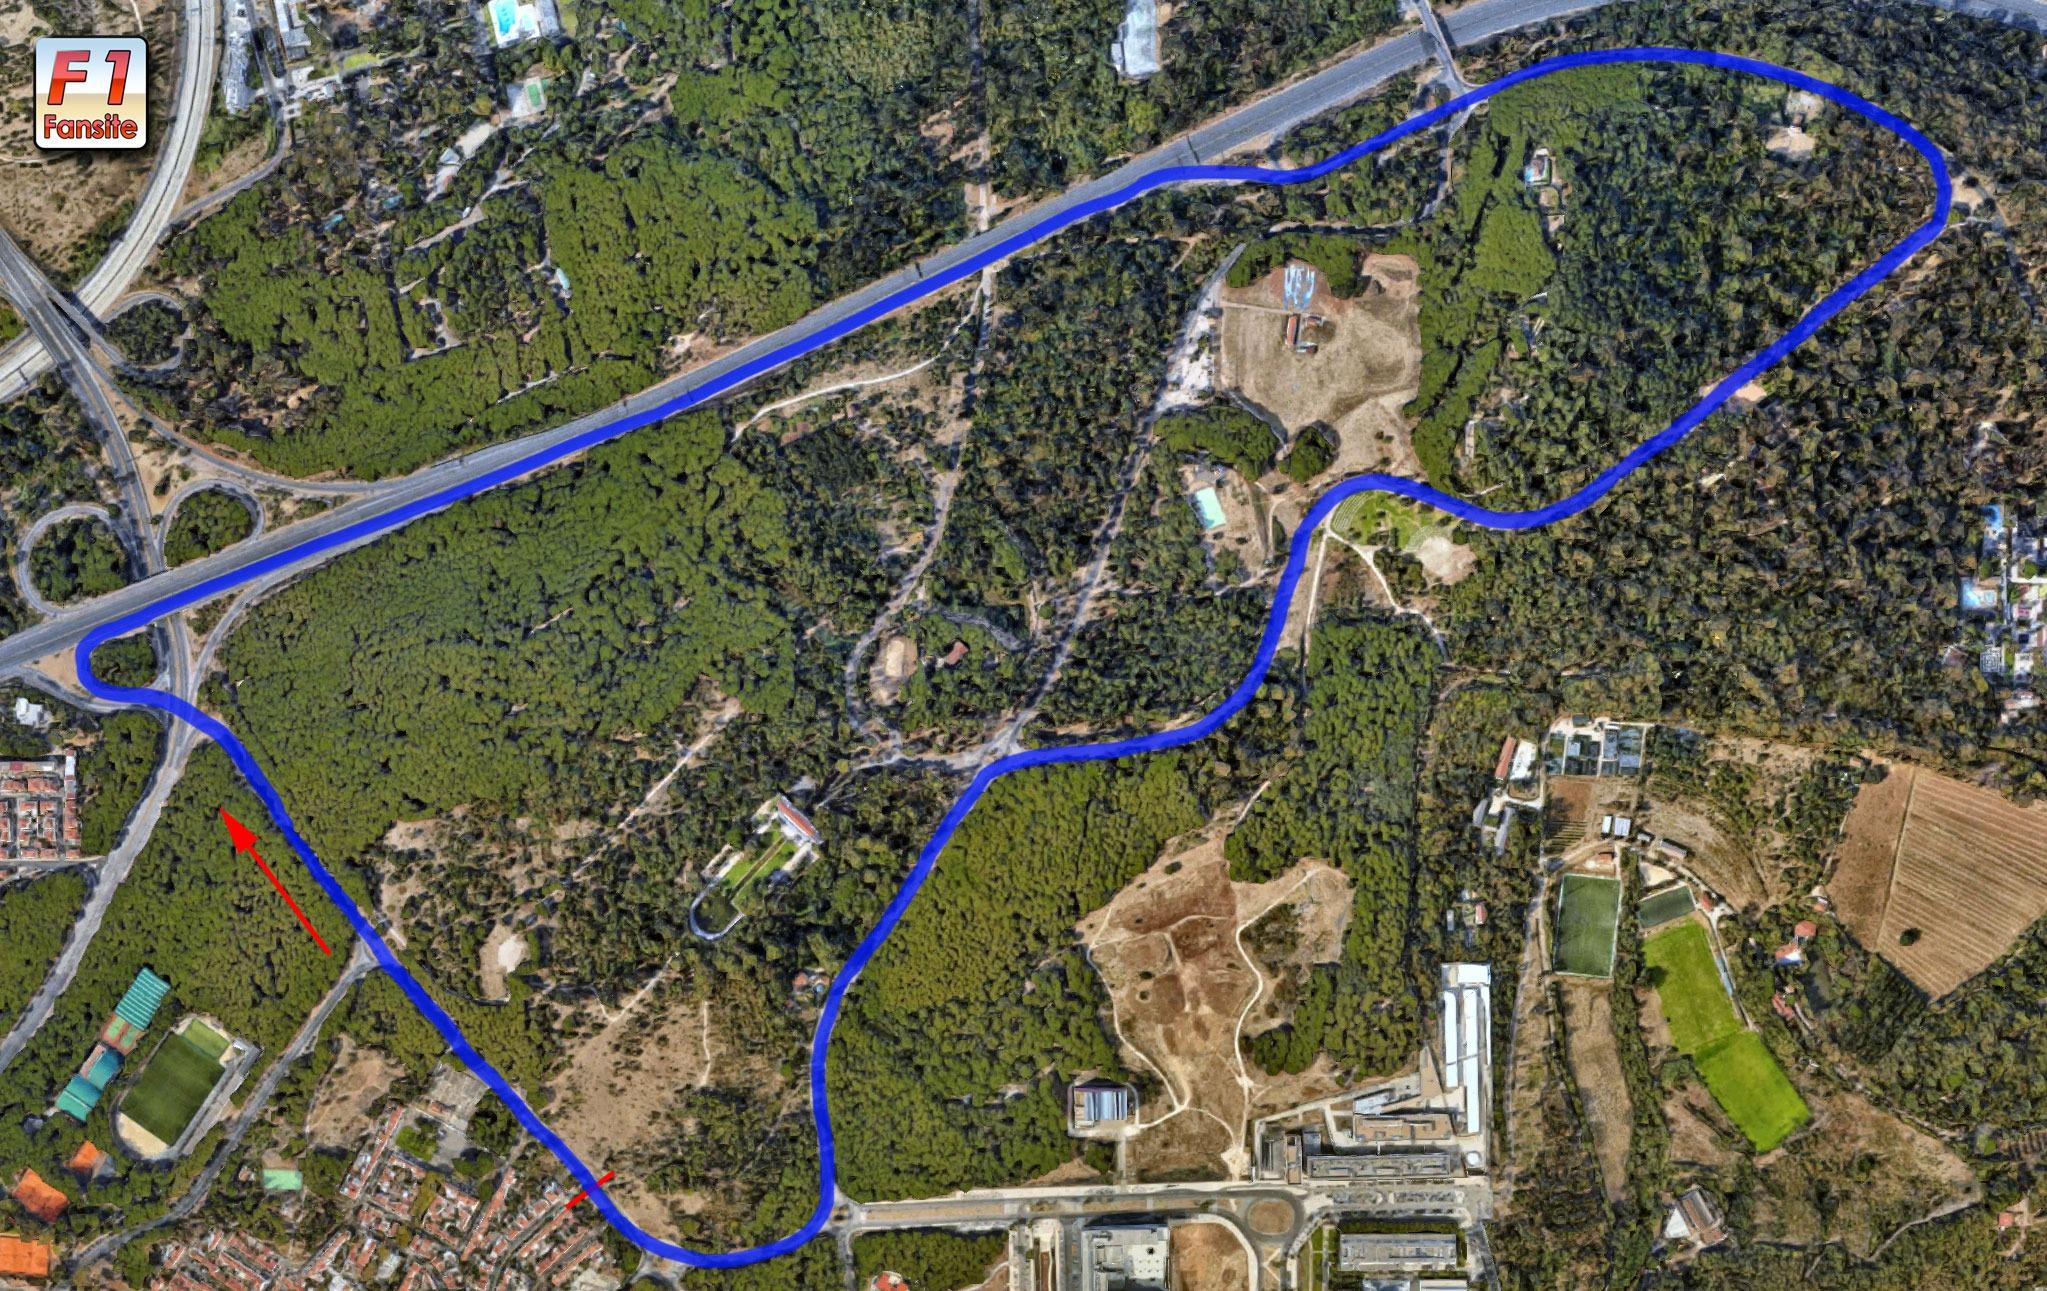 Monsanto Park Circuit layout